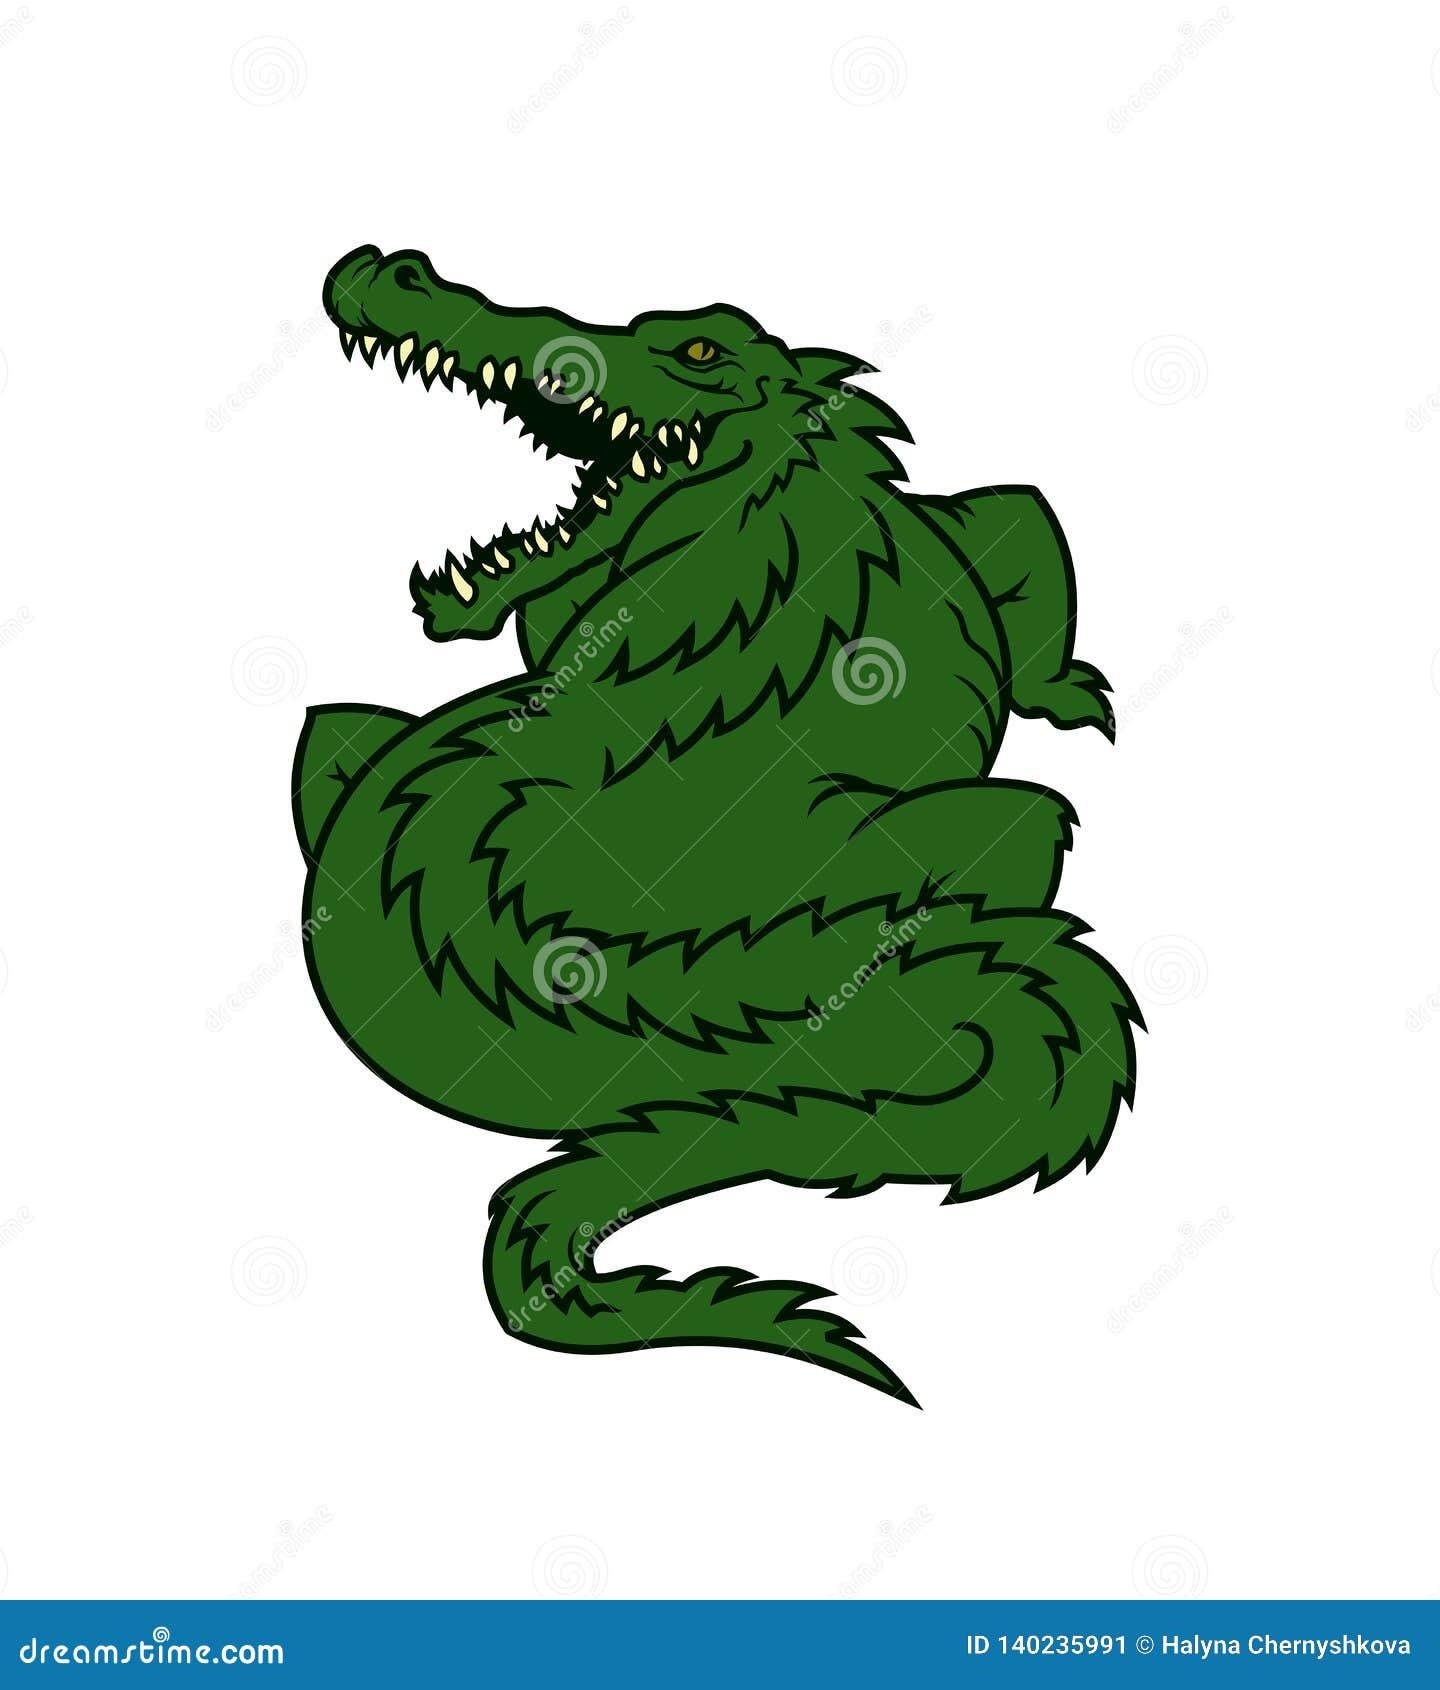 Alligator cartoon mascot character. Fat gator icon